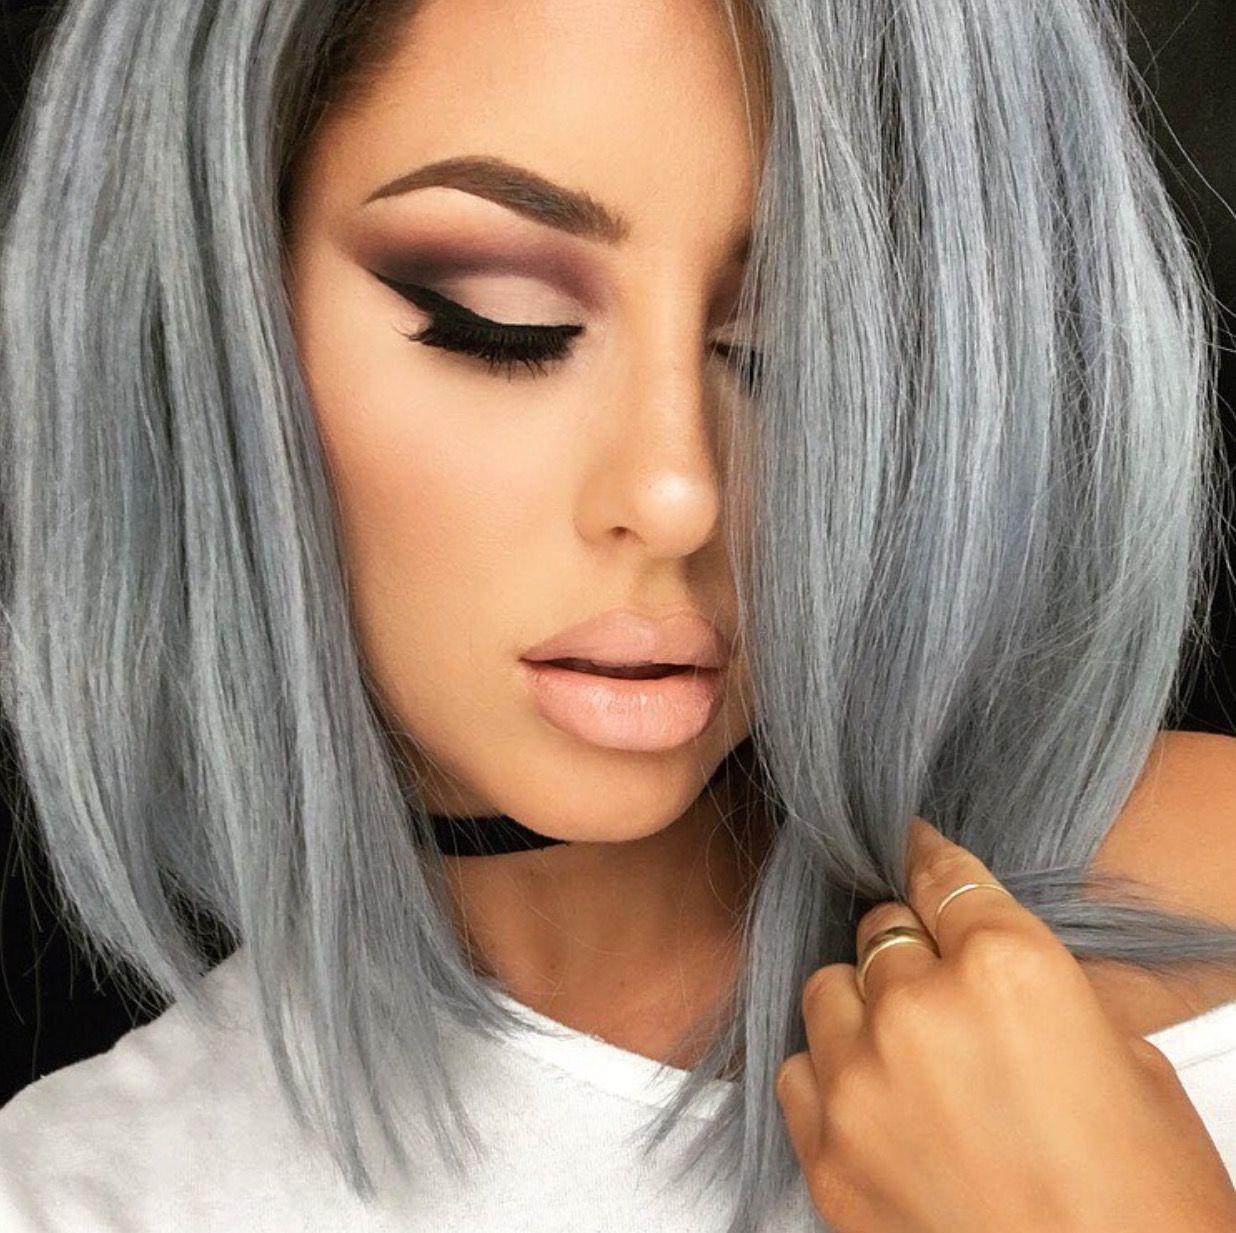 Pin By Angelita Rosales On Makeup Looks Pinterest Hair Makeup